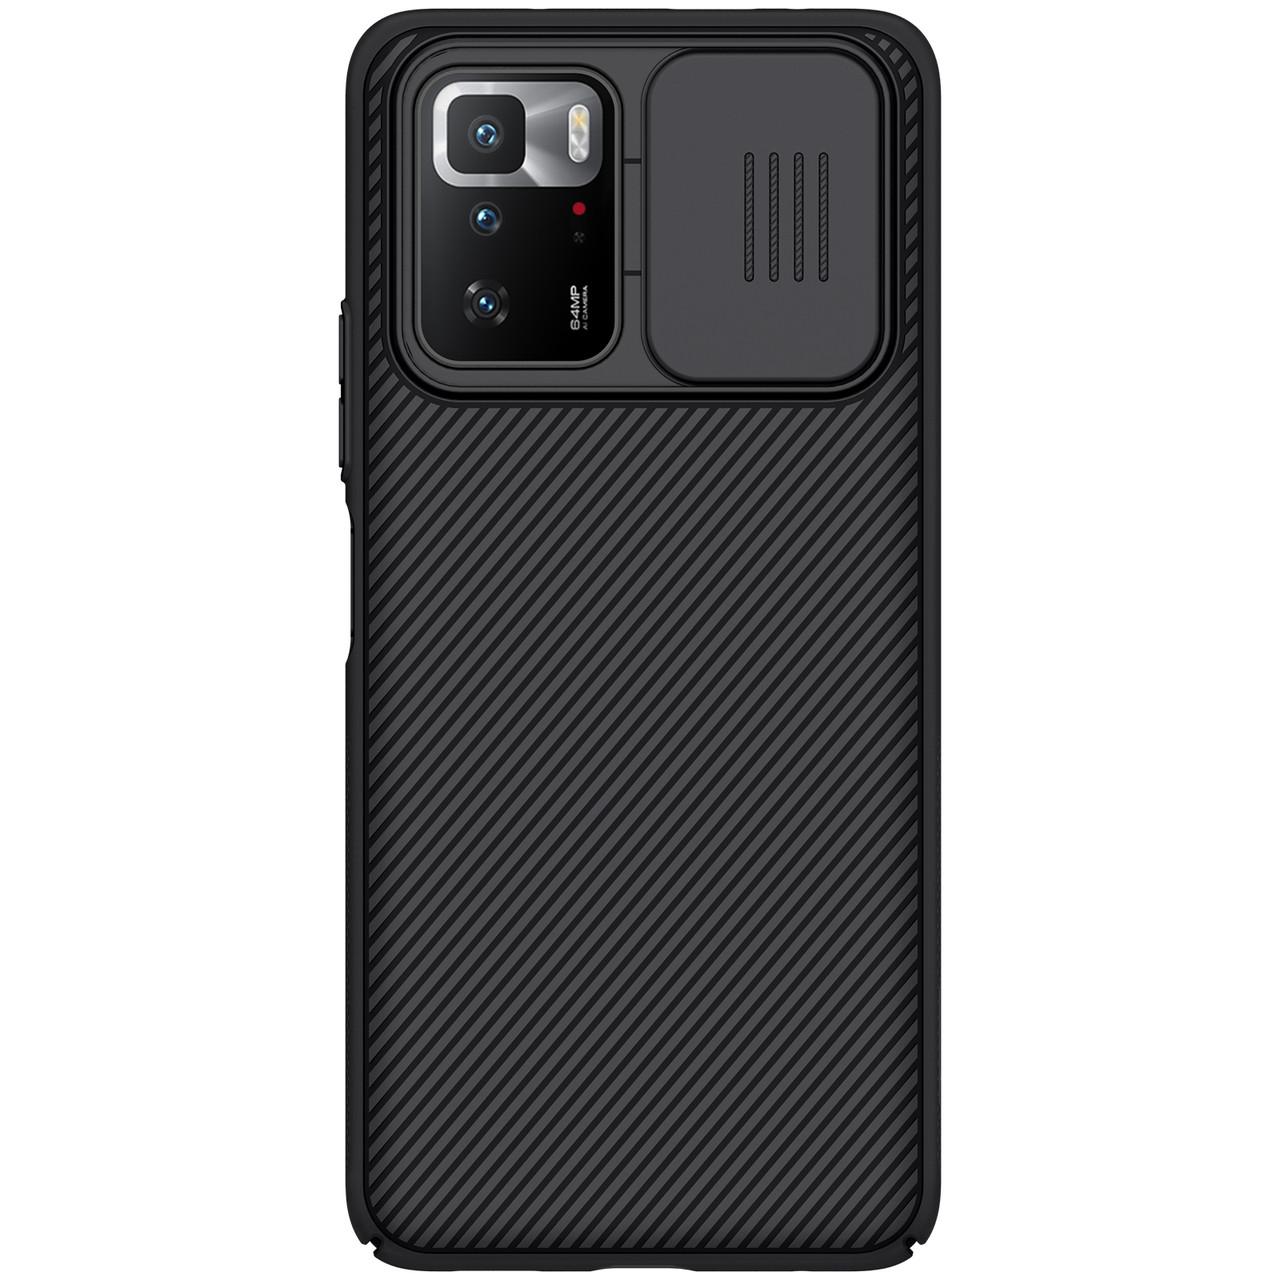 Защитный чехол Nillkin для Xiaomi Redmi Note 10 Pro 5G (CamShield Case) Black с защитой камеры